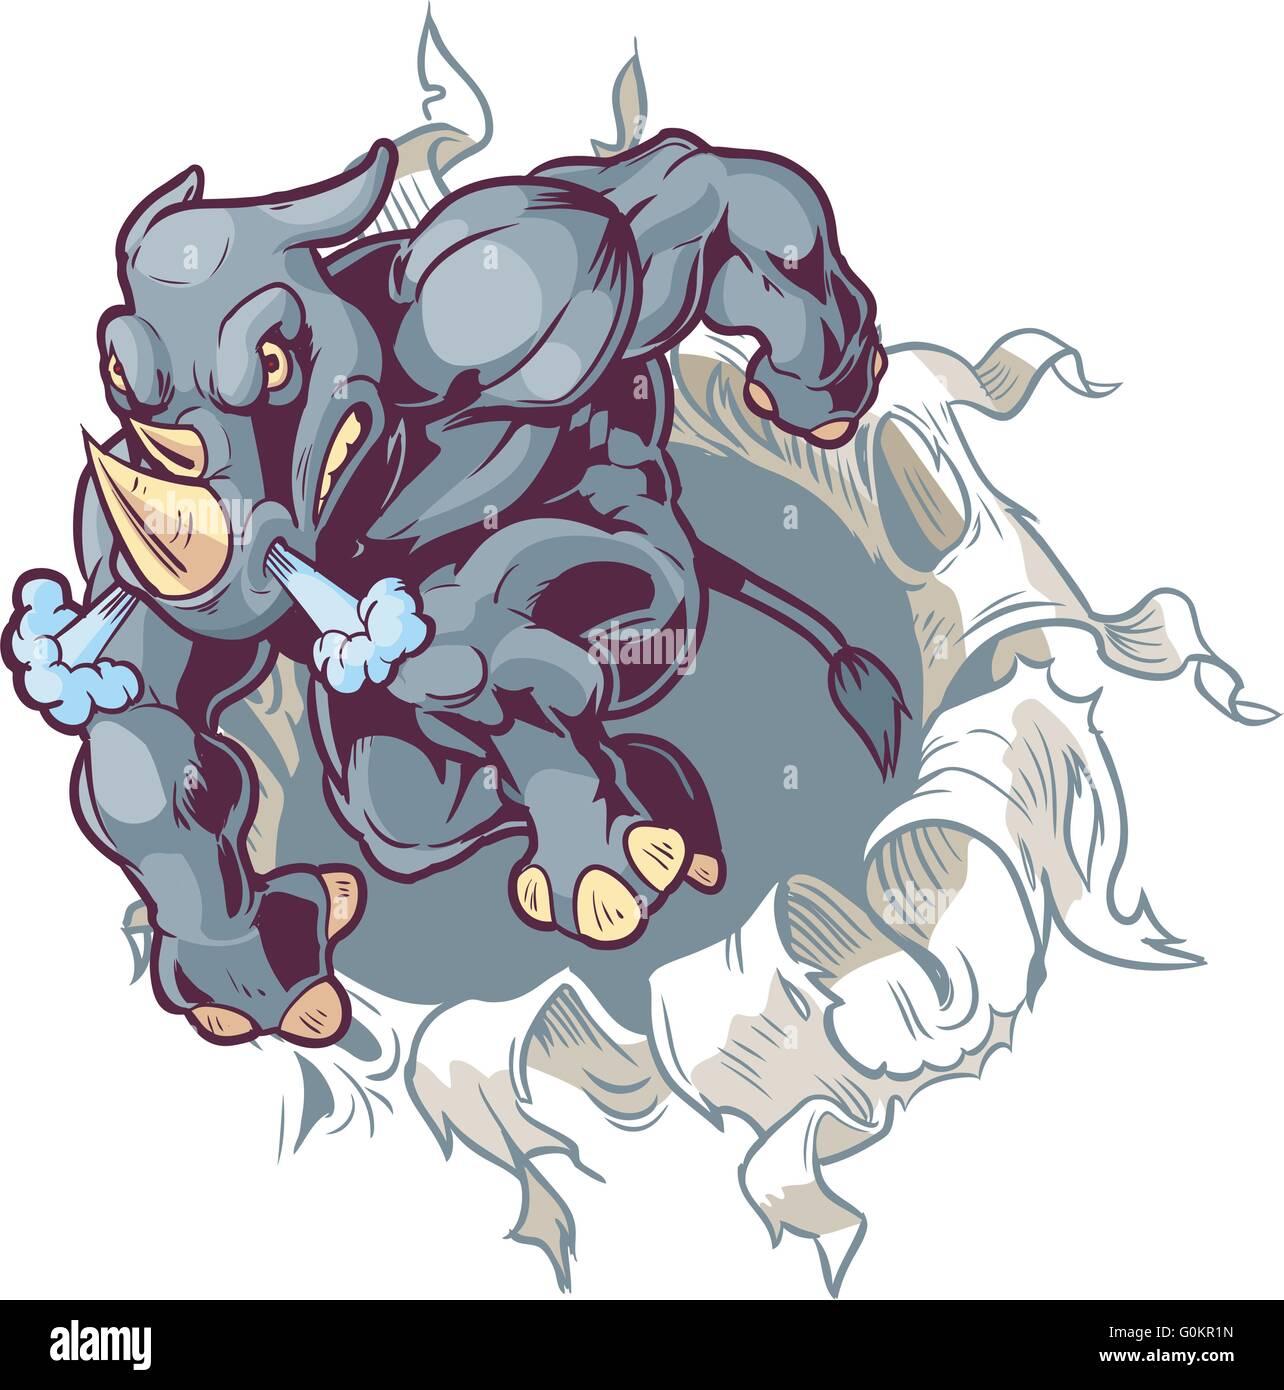 Vector Cartoon Clip Art Illustration of a Crouching Anthropomorphic Cartoon Mascot Rhino Ripping Through a Paper - Stock Image